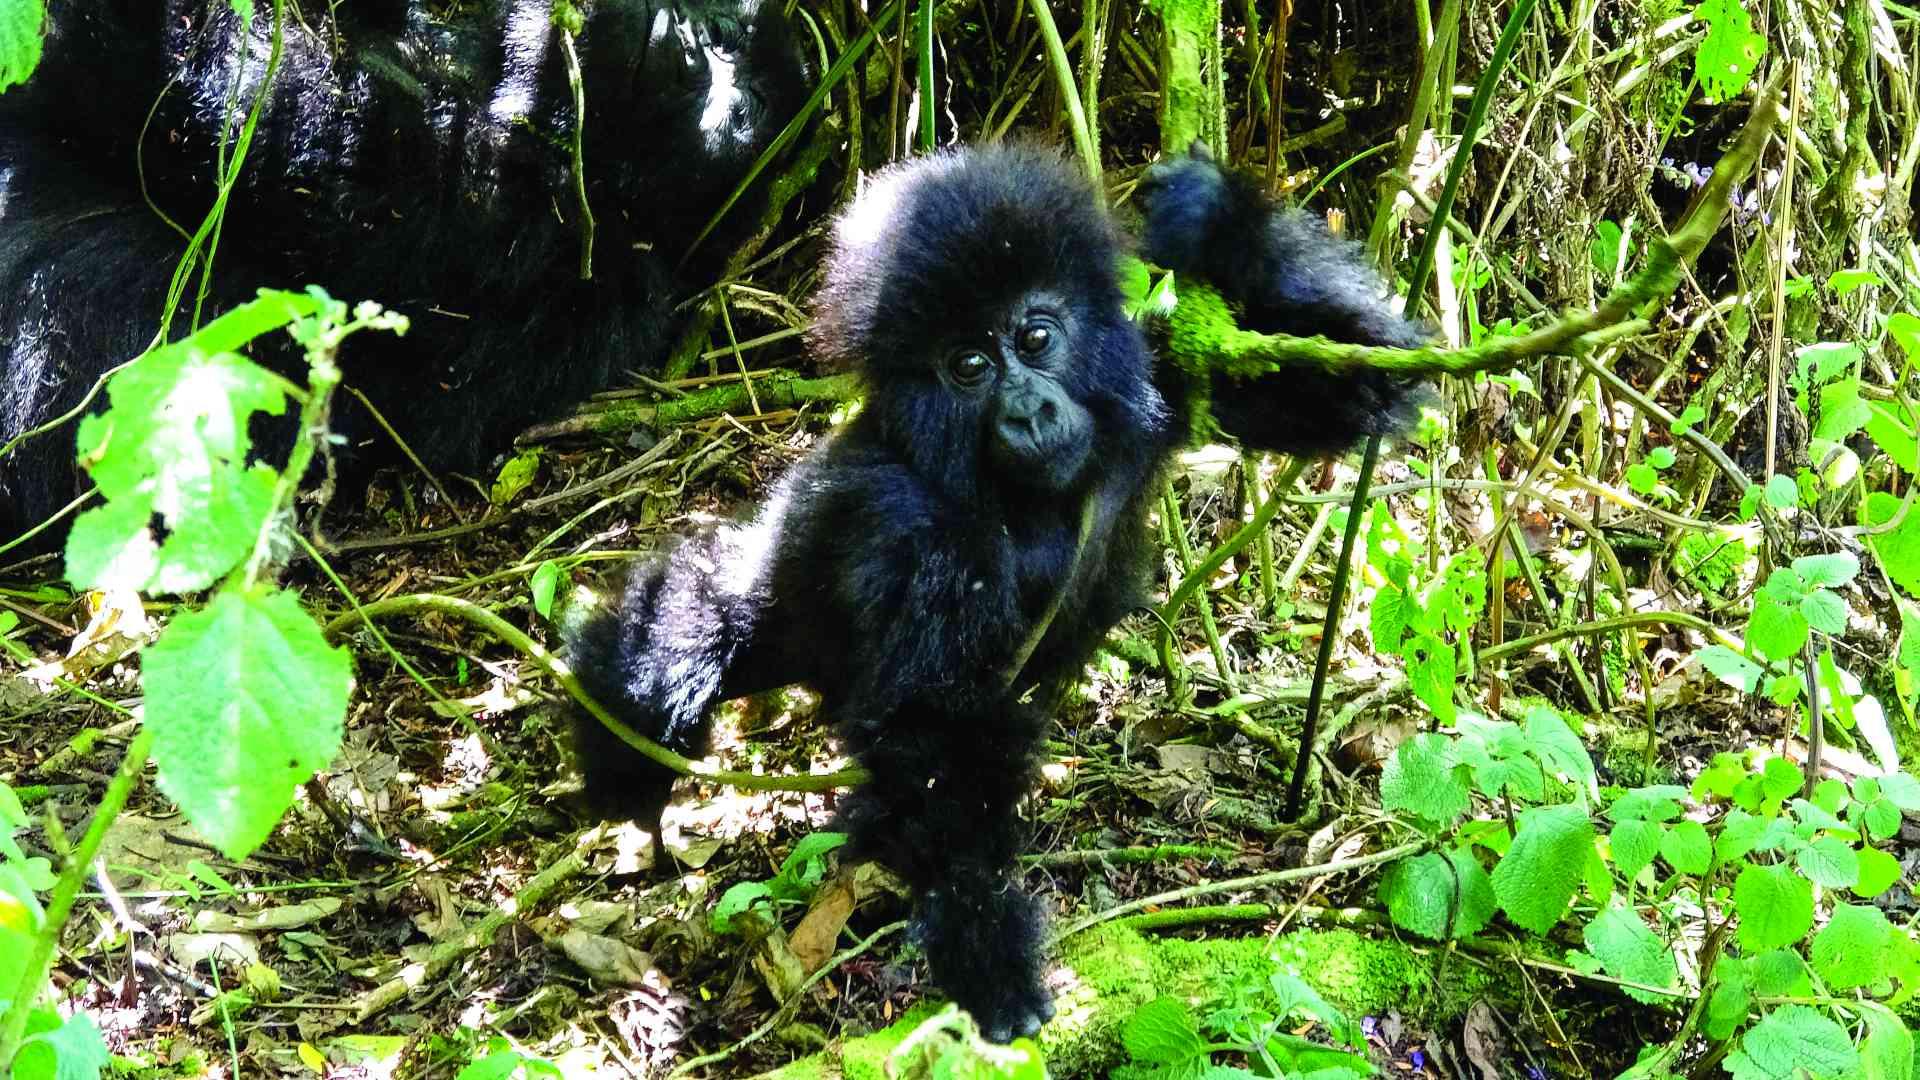 Gorilla, Rwanda by Dennis Bunnik